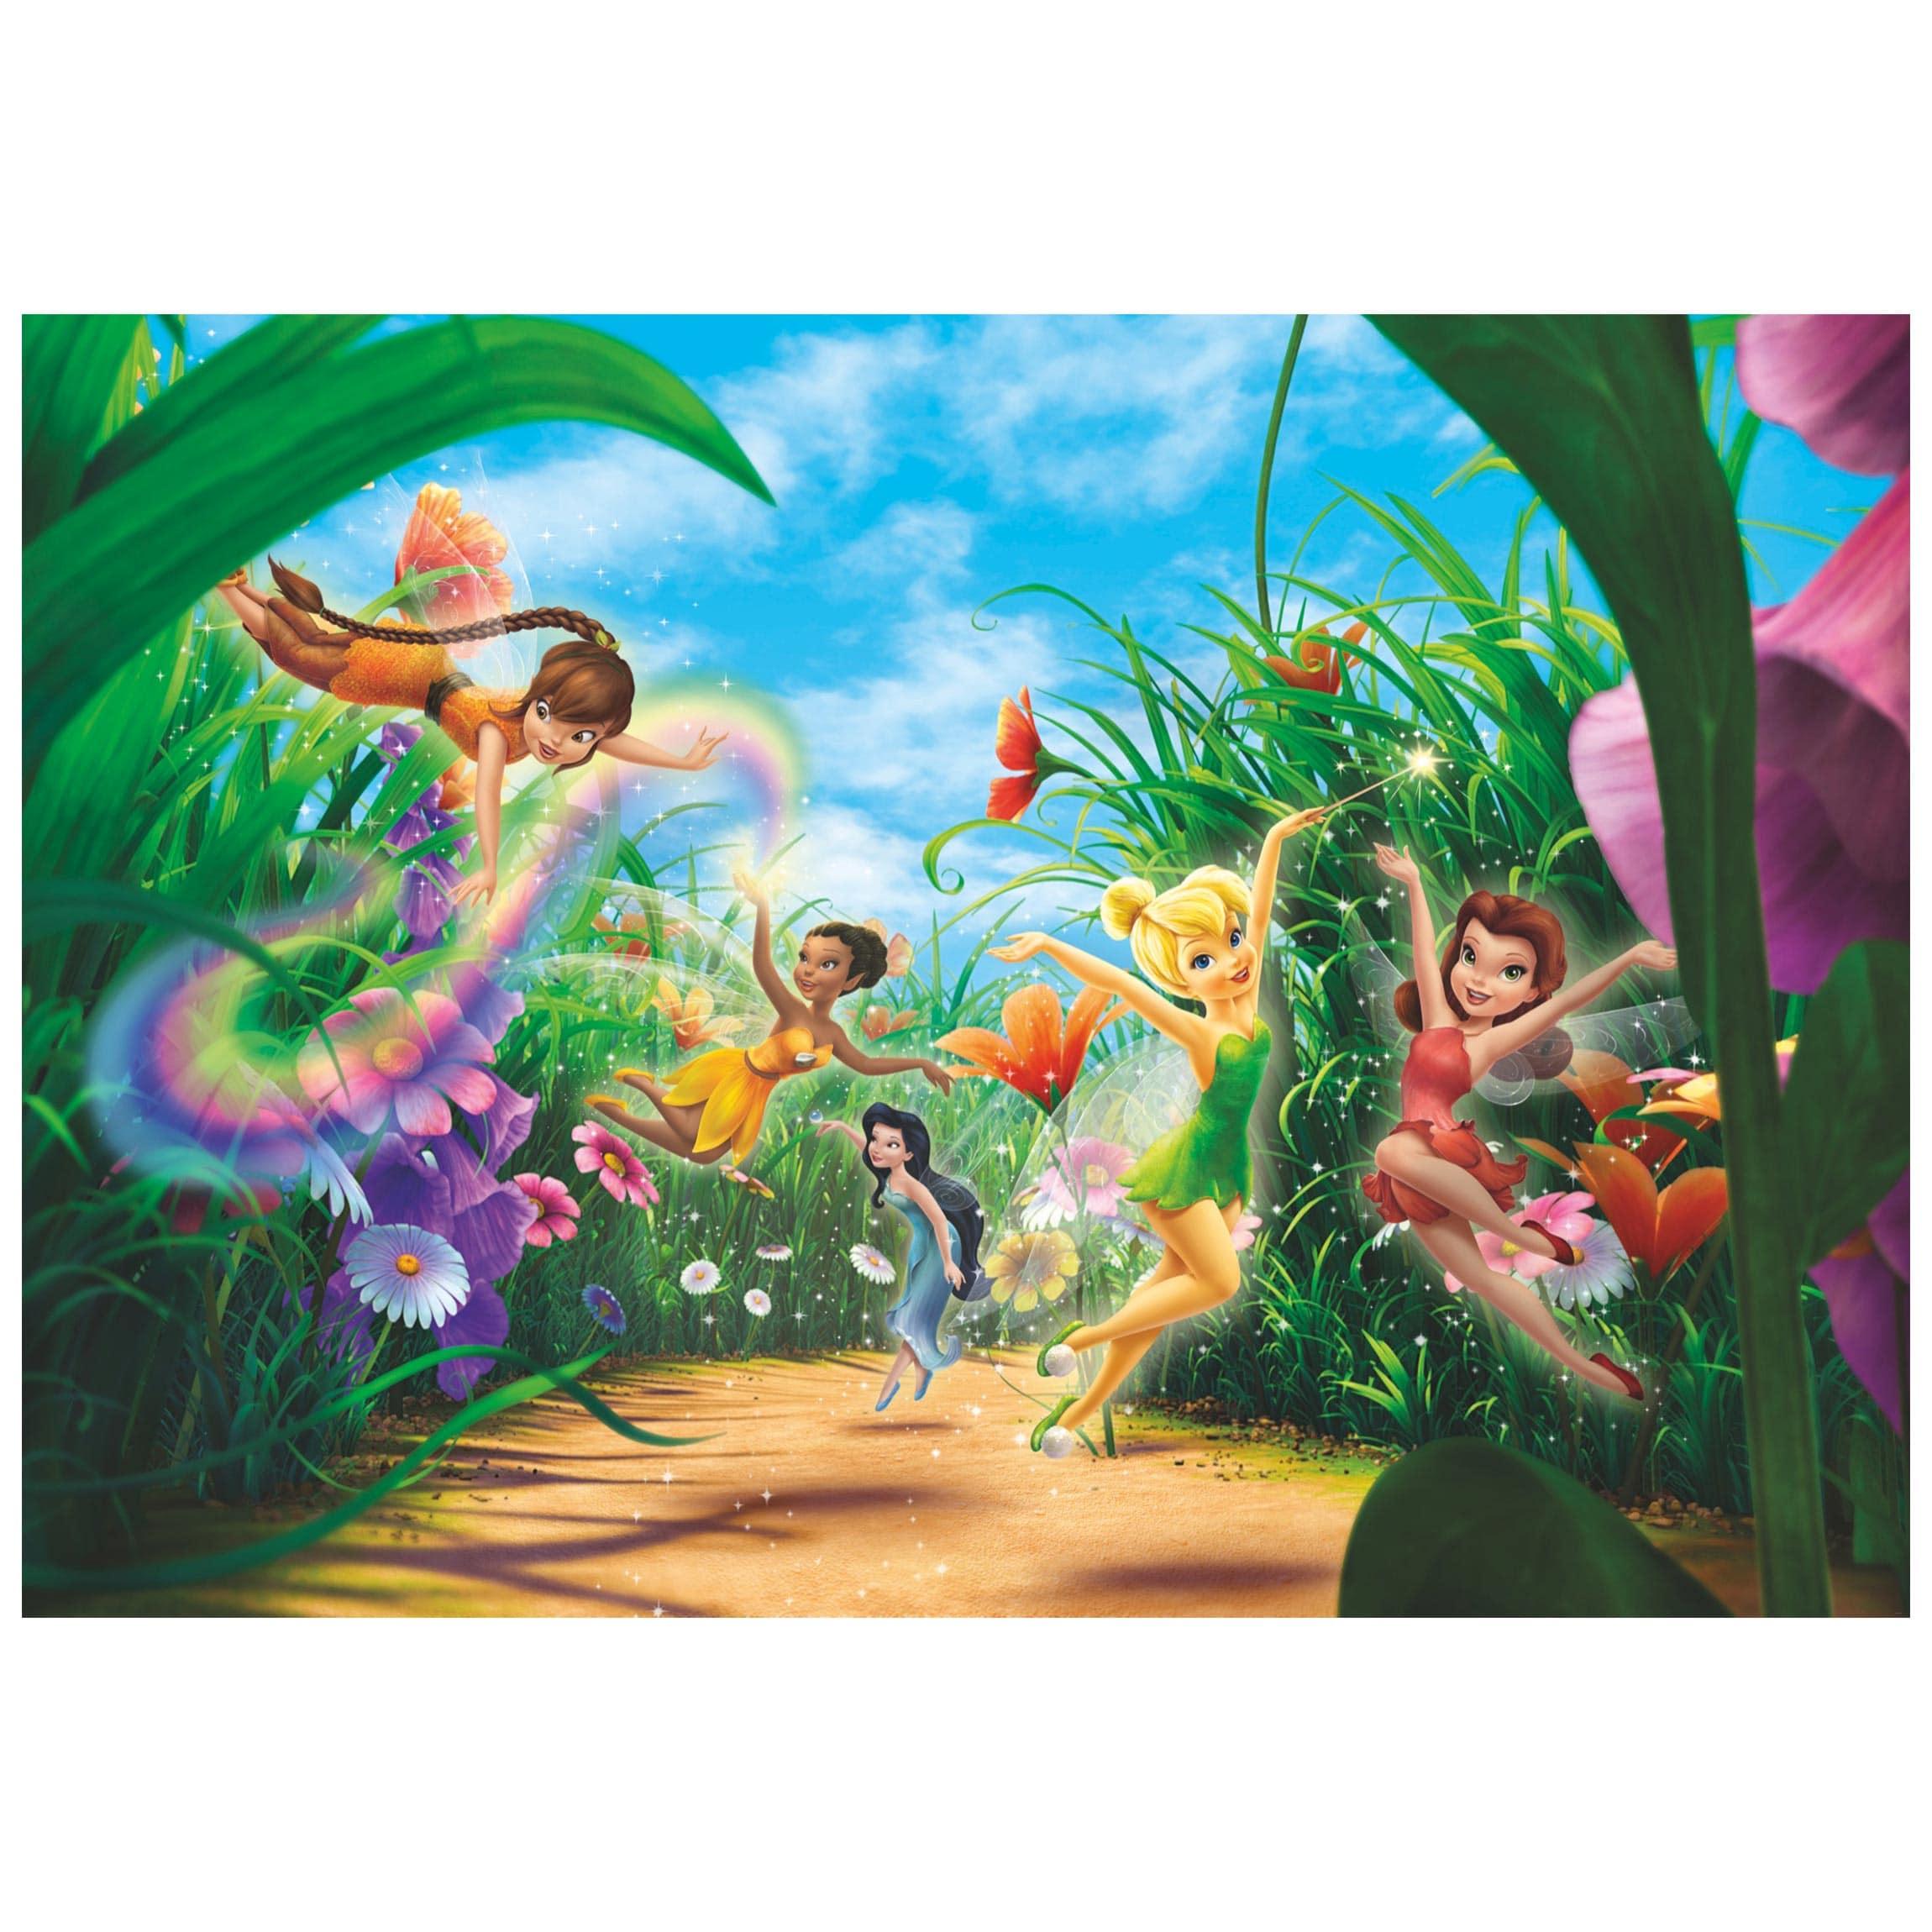 Carta Da Parati Prato.Carta Da Parati Per Bambini Disney Fairies Prato Fotomurale